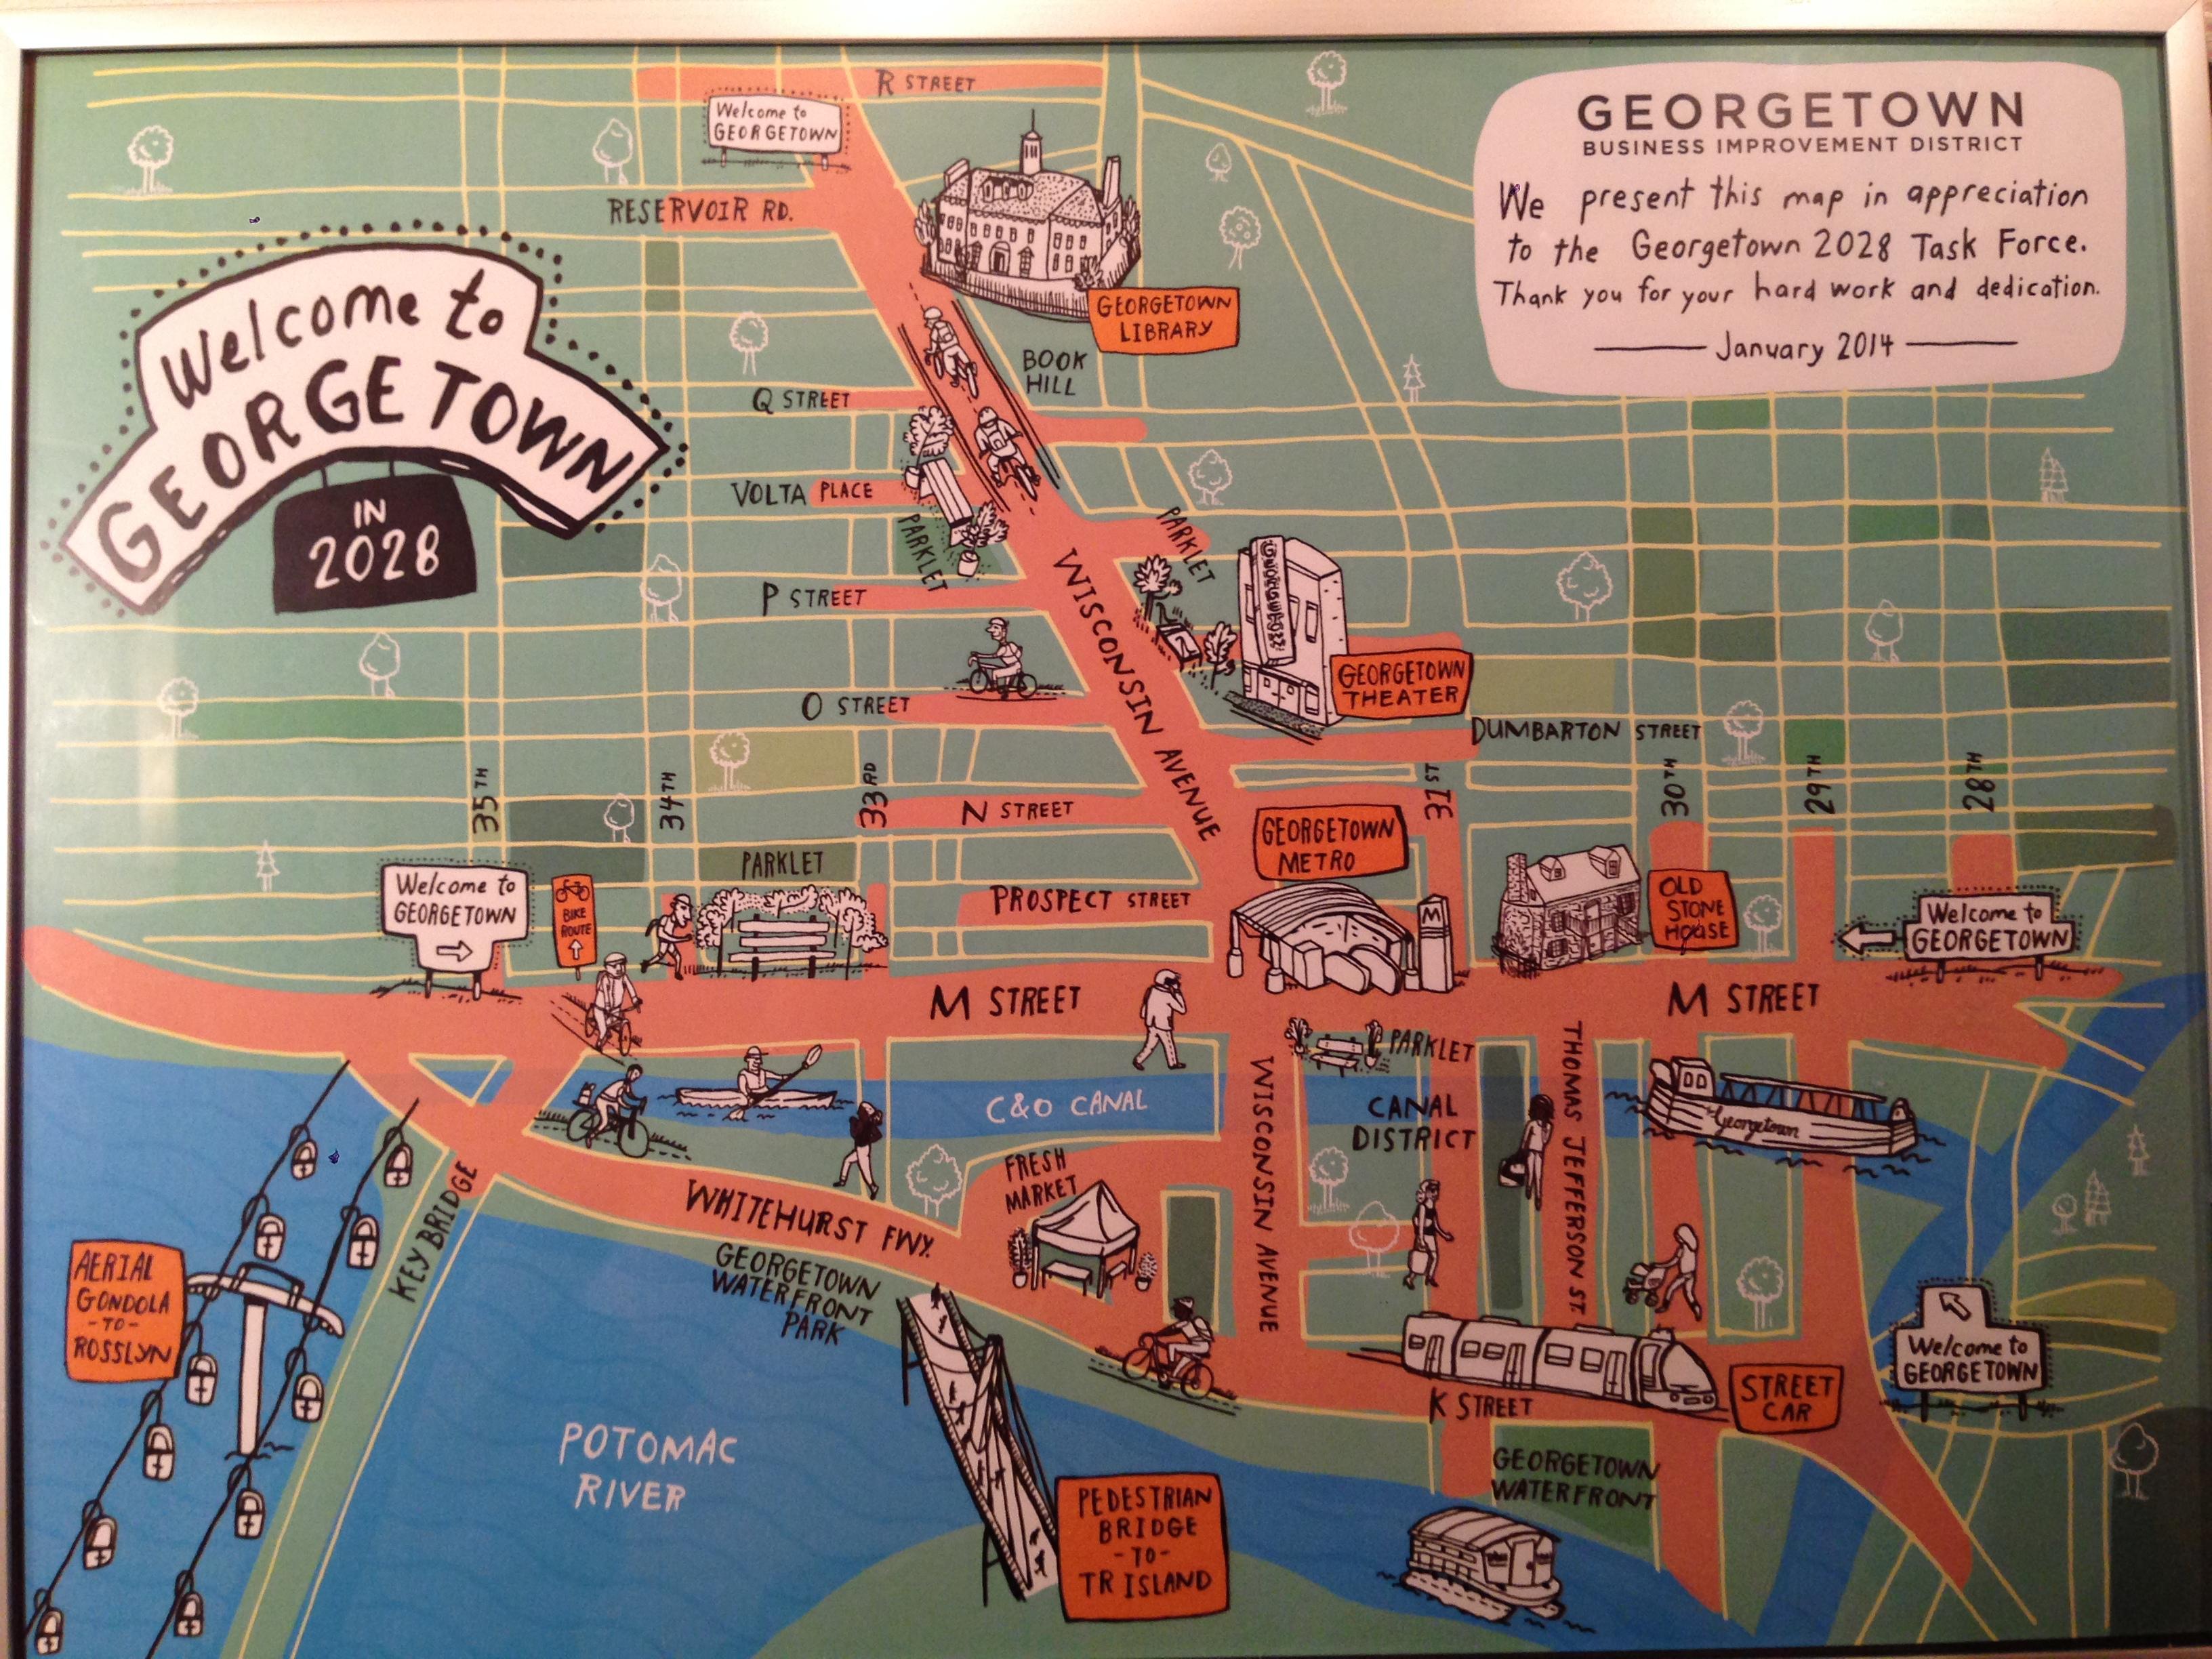 Map Of Georgetown Map of Georgetown in 2028 (Hopefully) | The Georgetown Metropolitan Map Of Georgetown